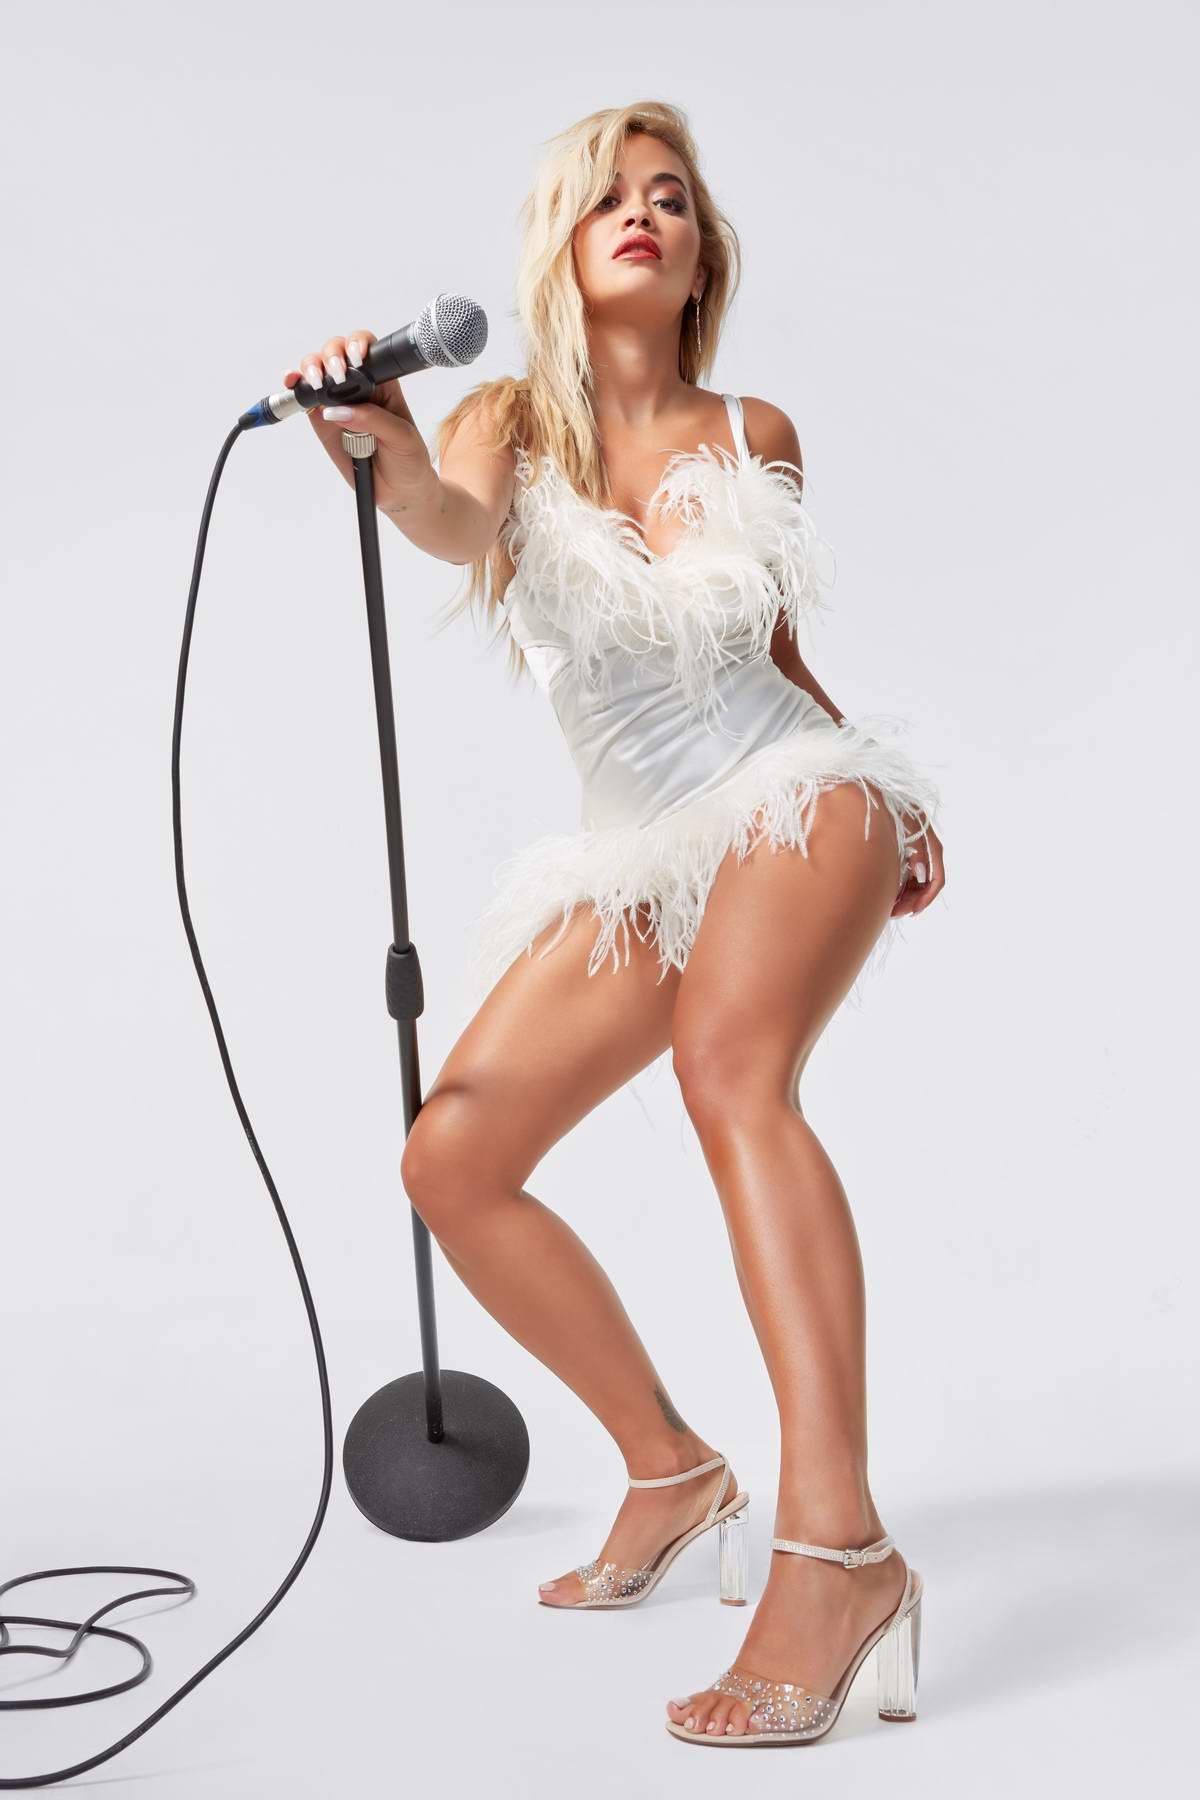 Rita Ora models for a new ShoeDazzle Campaign, October 2020